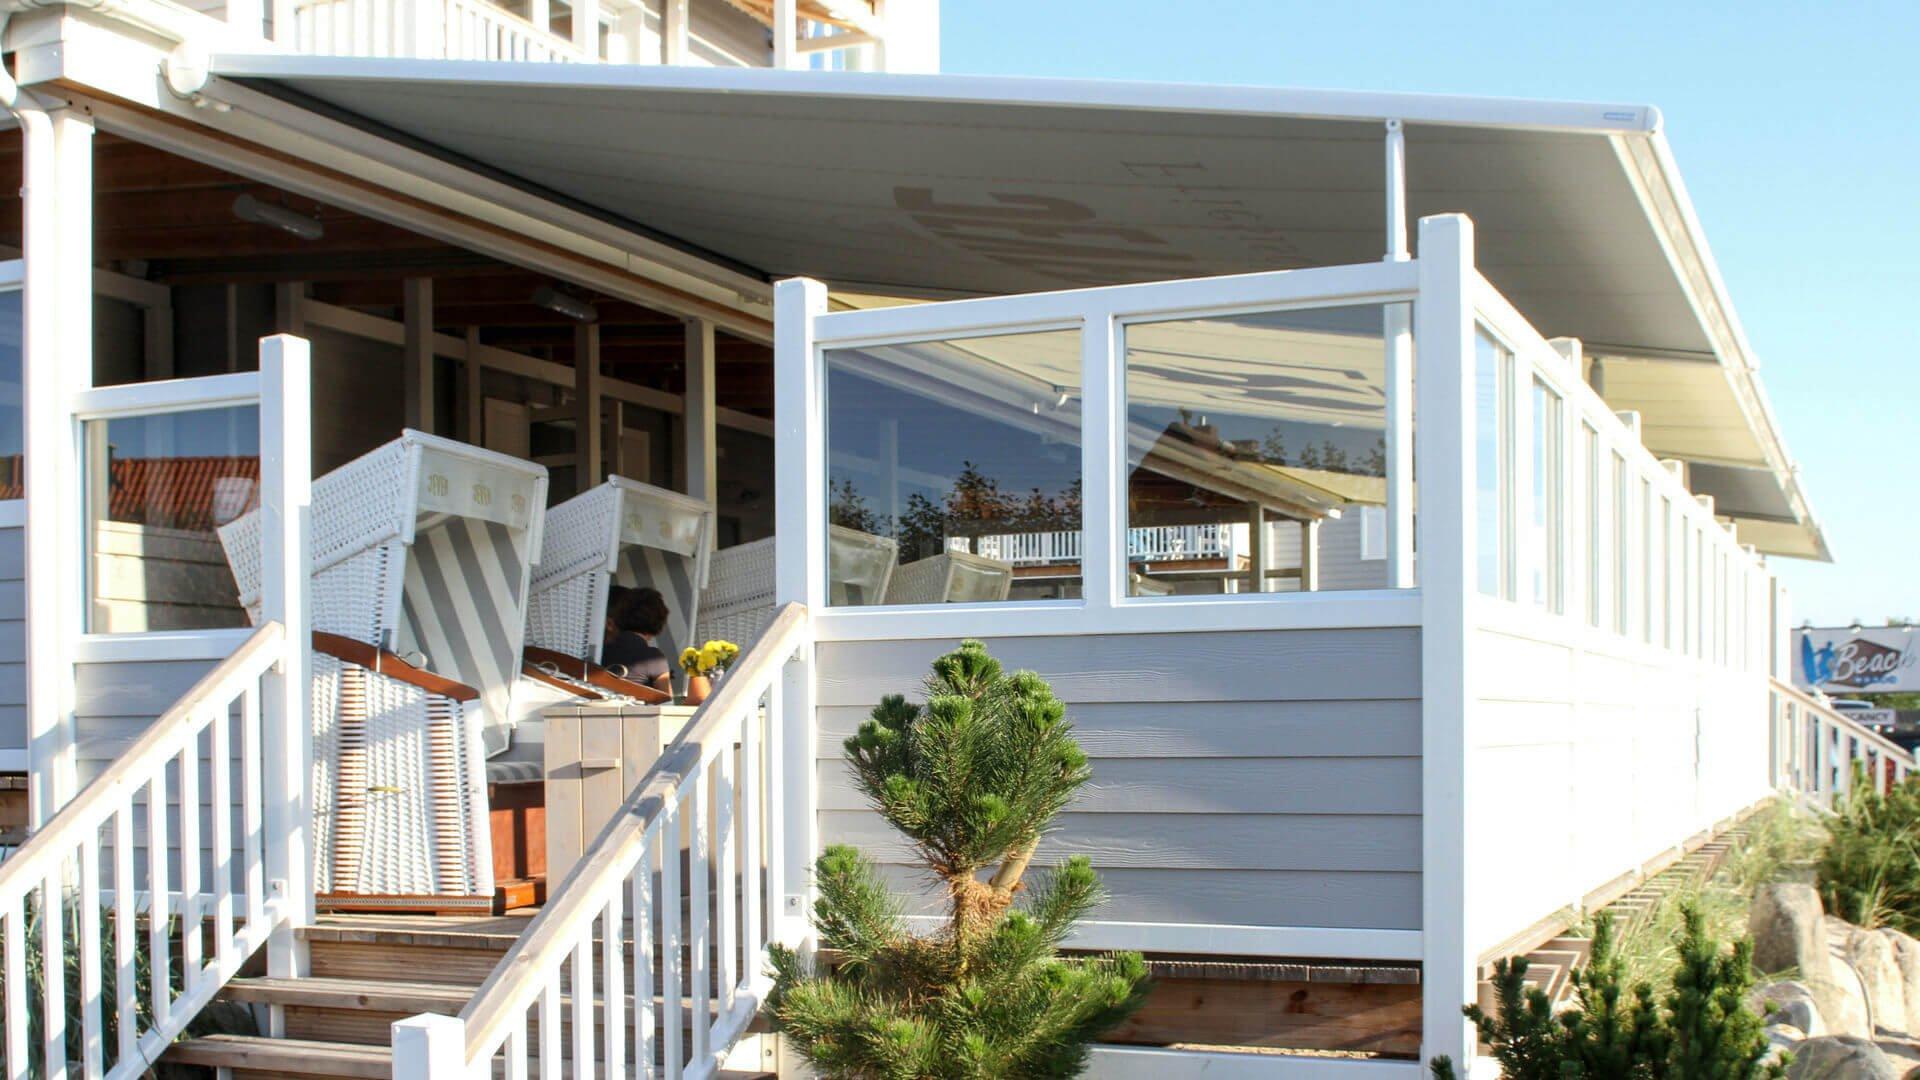 Markilux pergola 110-210 hotel de playa